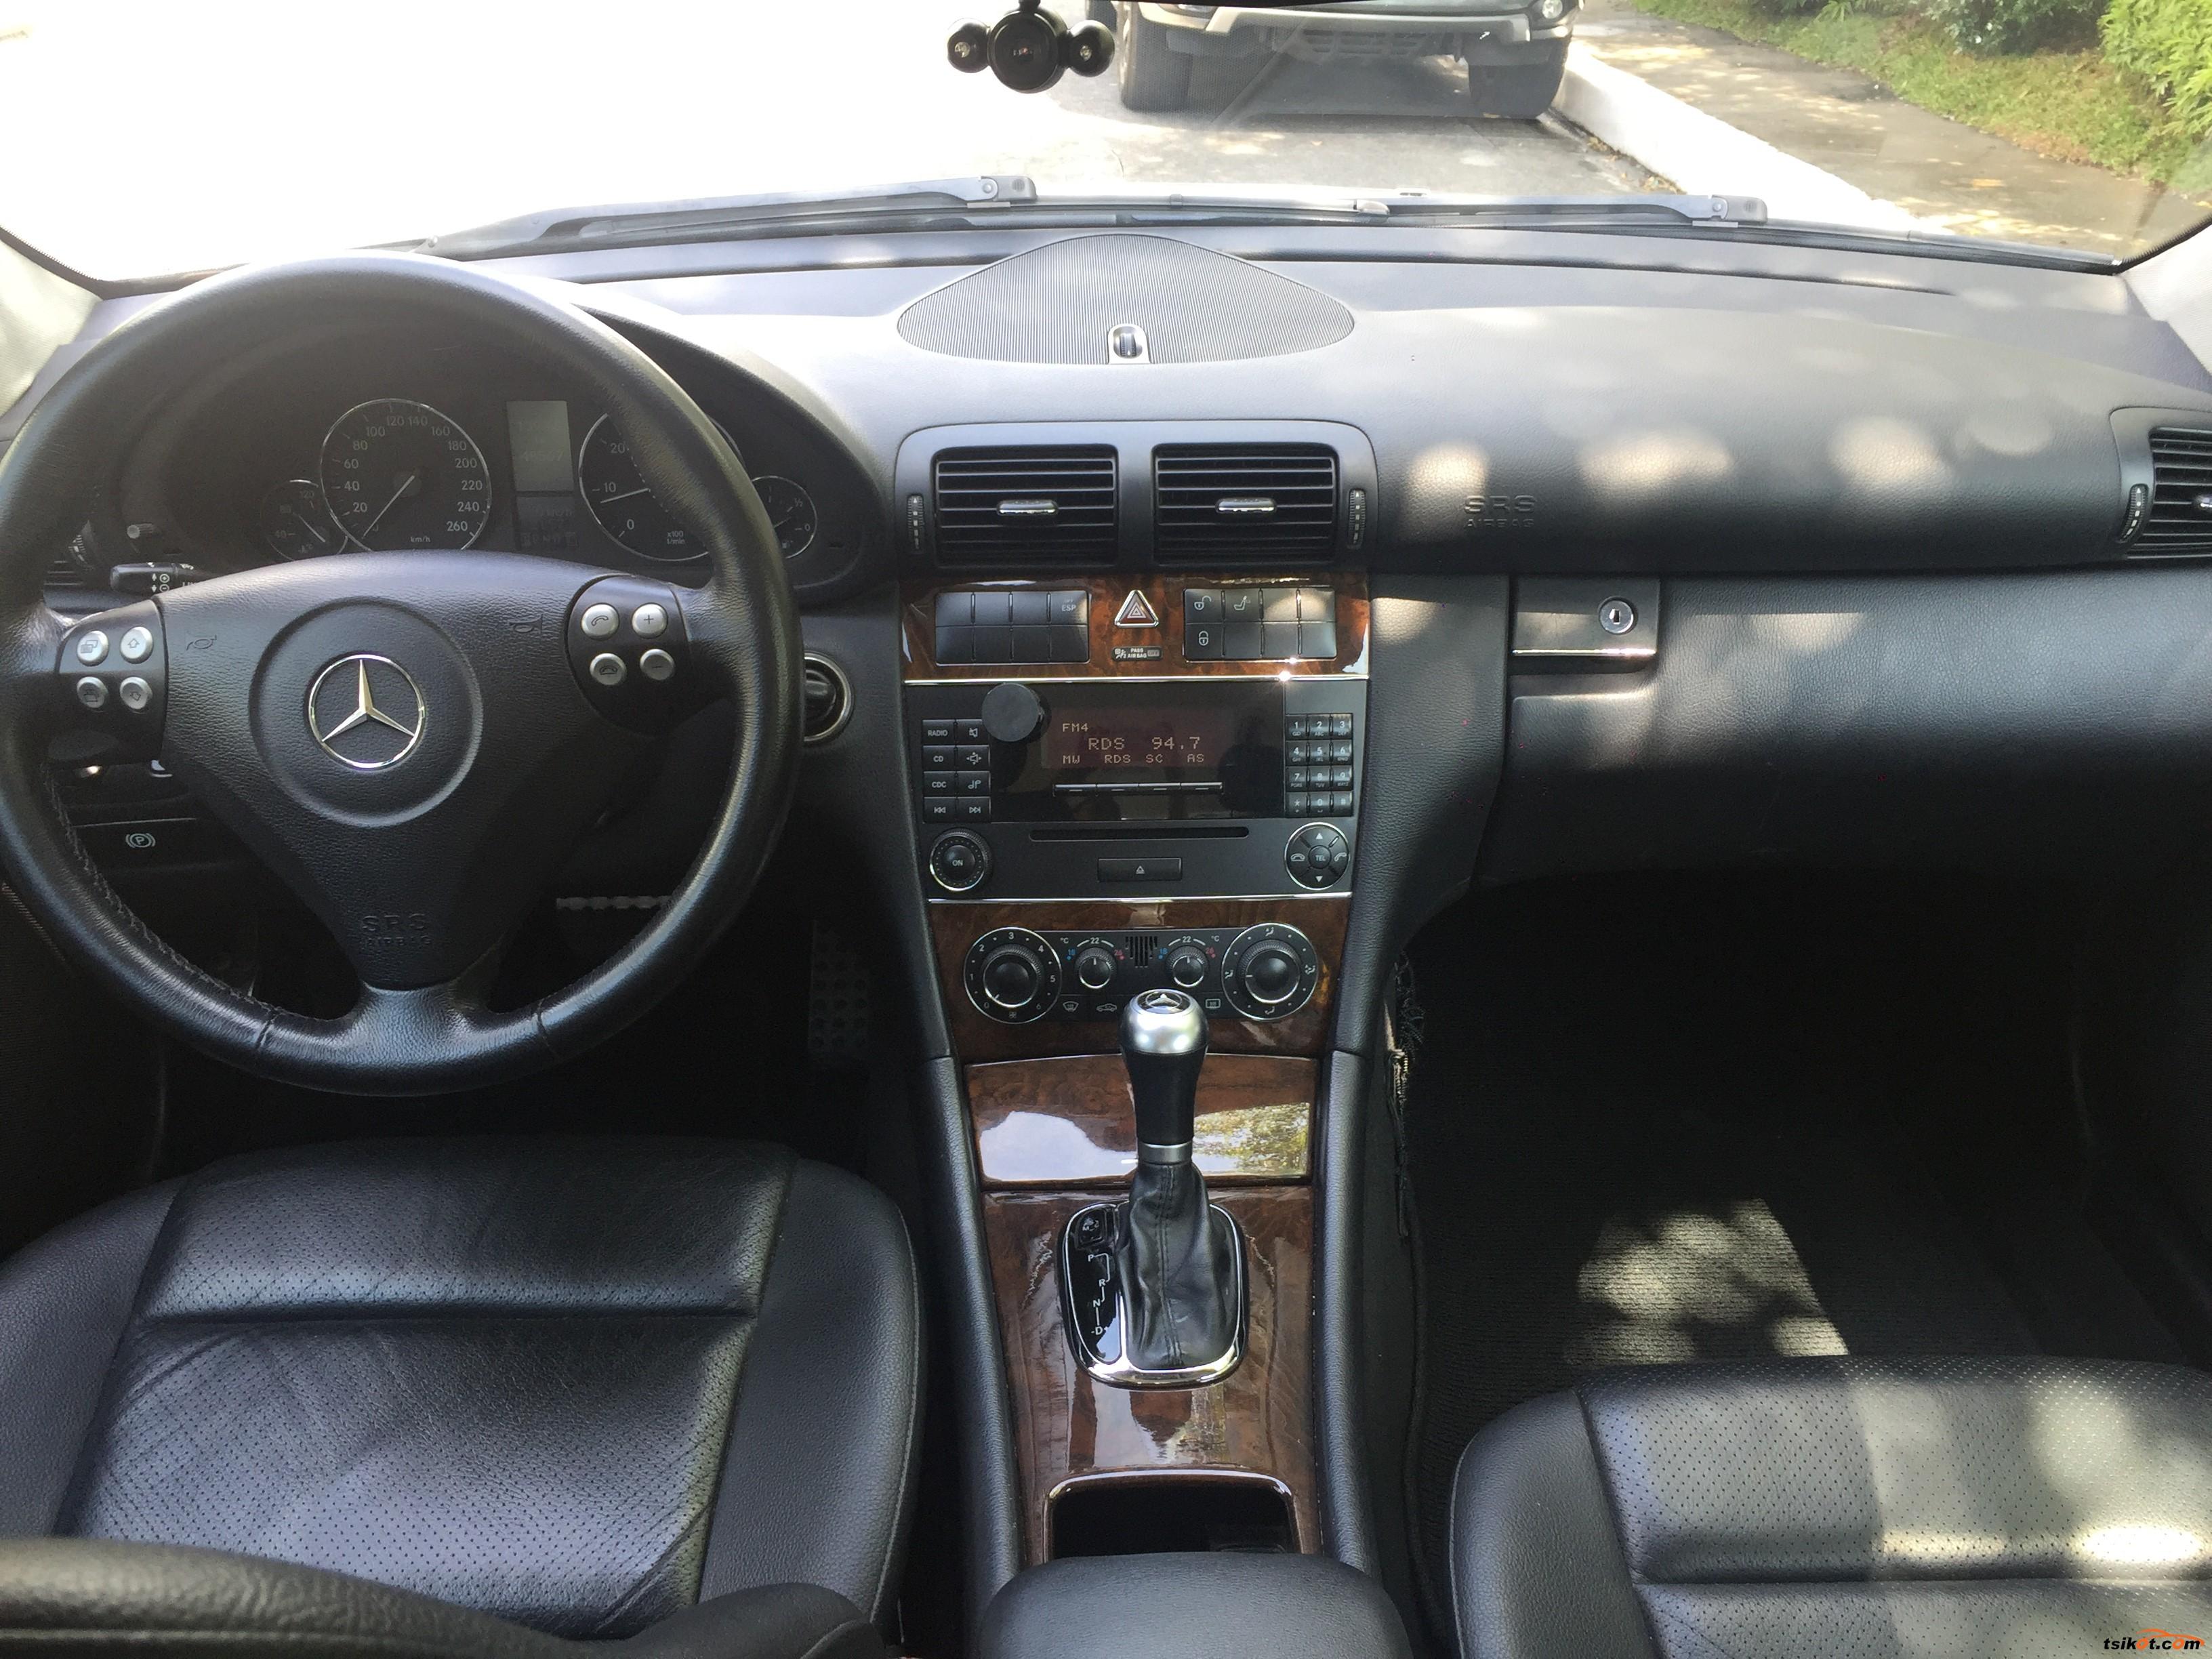 Mercedes-Benz 180 2005 - 6